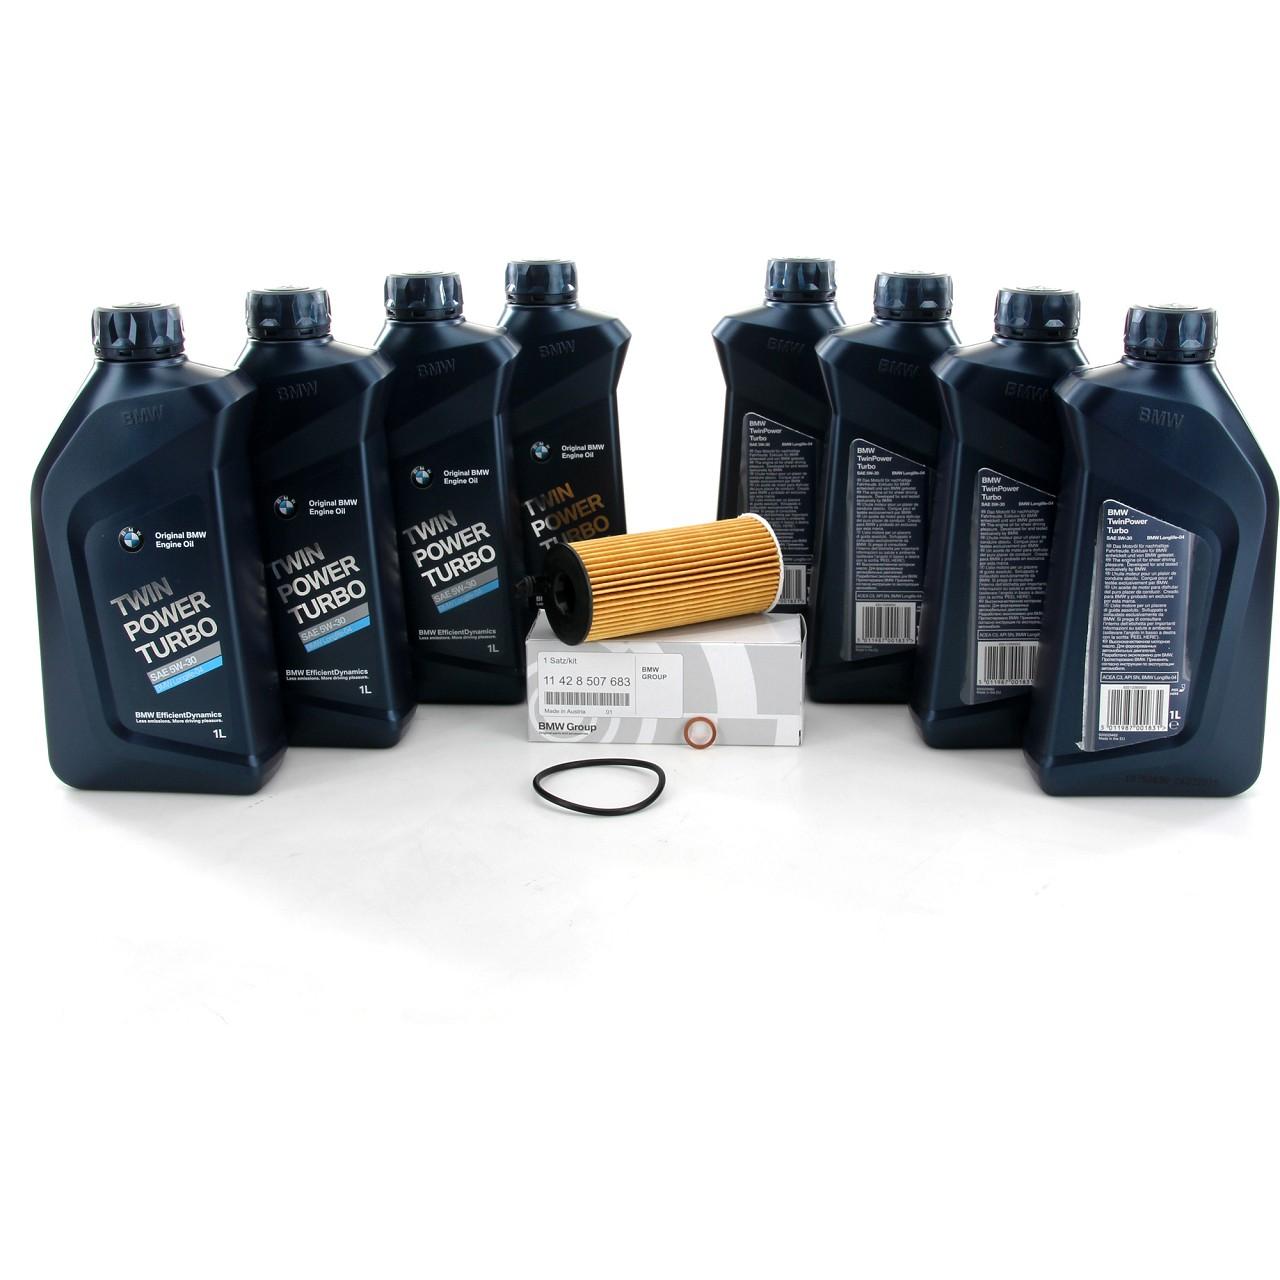 ORIGINAL BMW Motoröl Öl 5W30 LongLife-04 8 Liter + Ölfilter 11428507683